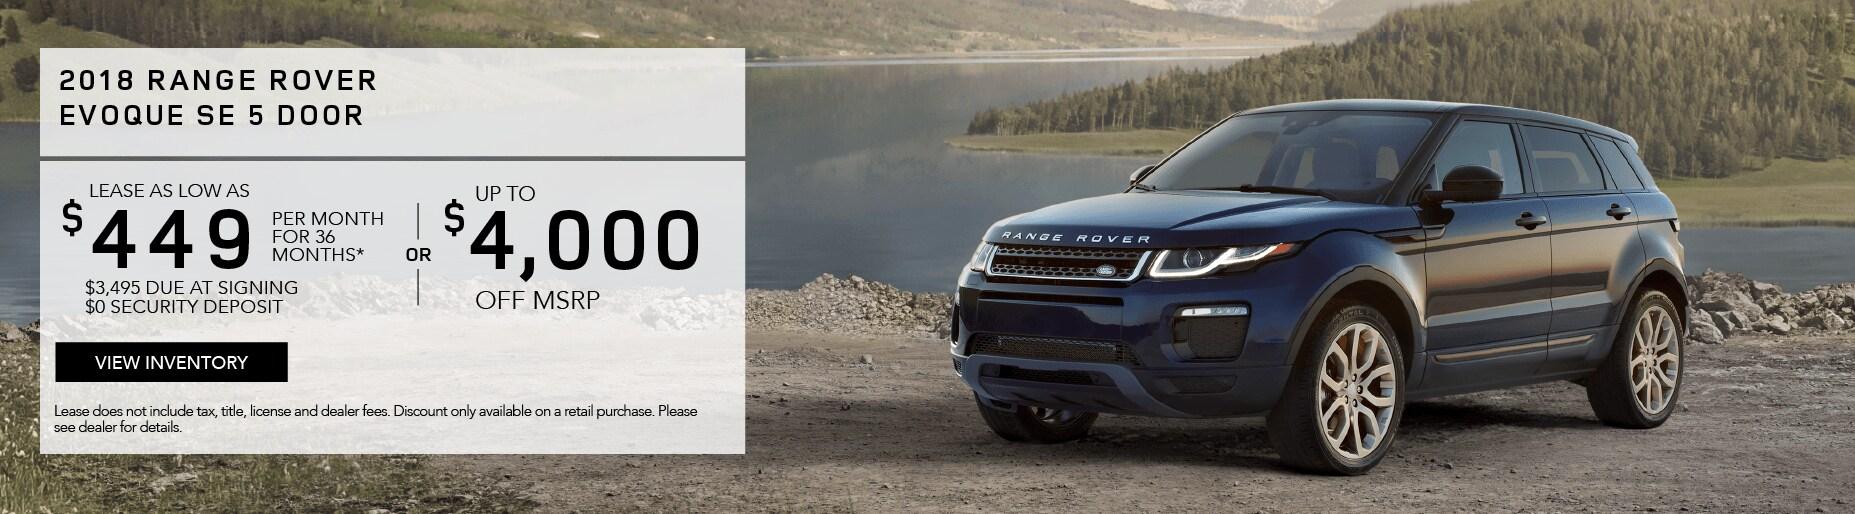 Land Rover Houston Central: New & Used Car Dealer